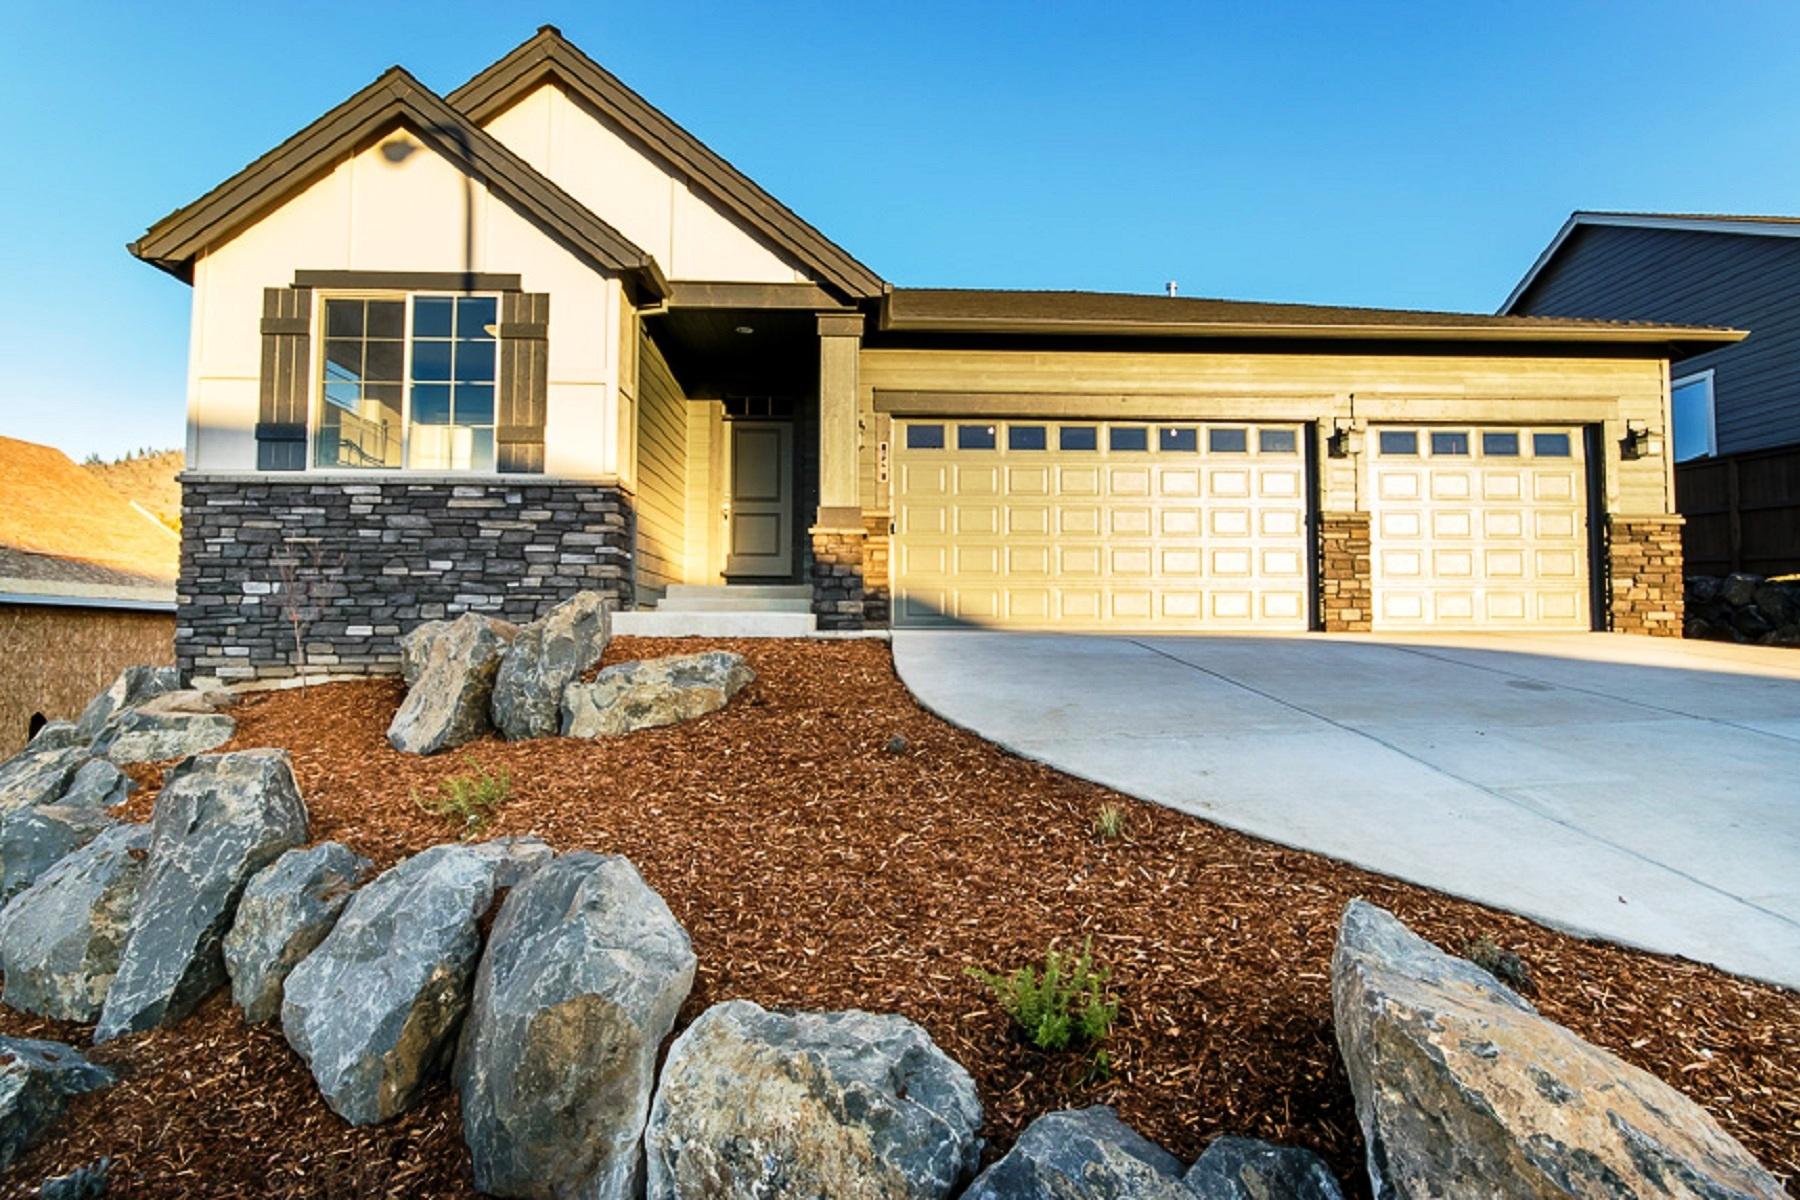 Moradia para Venda às 839 NE Hudspeth Circle Lot 148, PRINEVILLE 839 NE Hudspeth Cir Lot 148 Prineville, Oregon, 97754 Estados Unidos